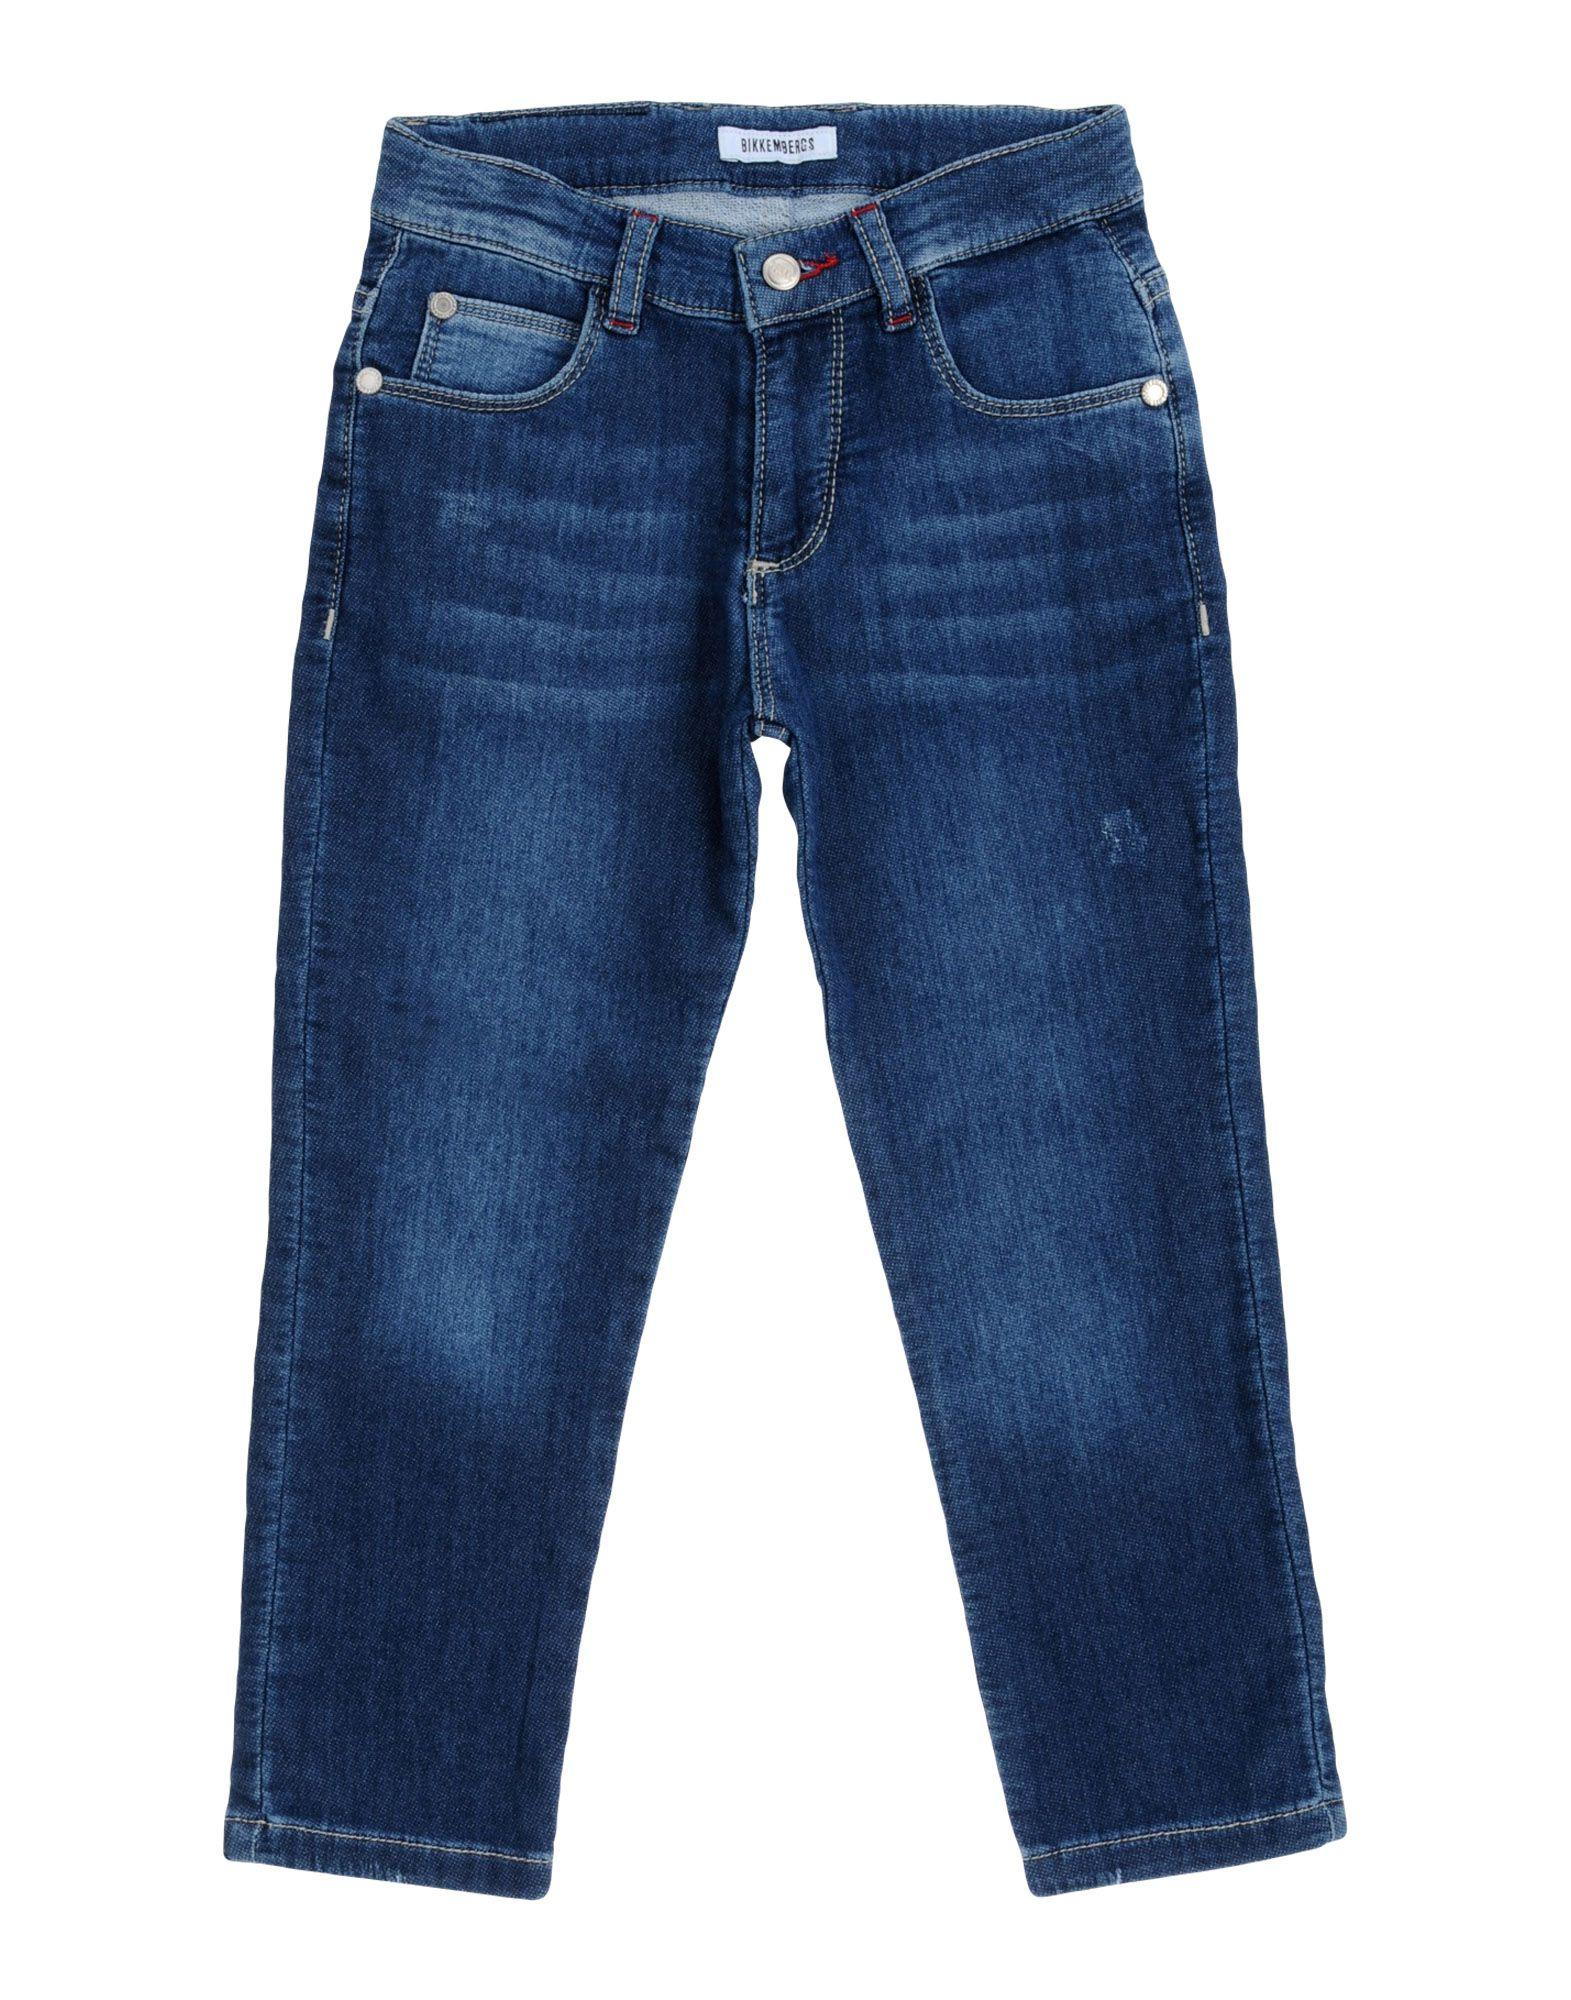 BIKKEMBERGS Джинсовые брюки брюки bikkembergs c q 62b fj s b099 e61